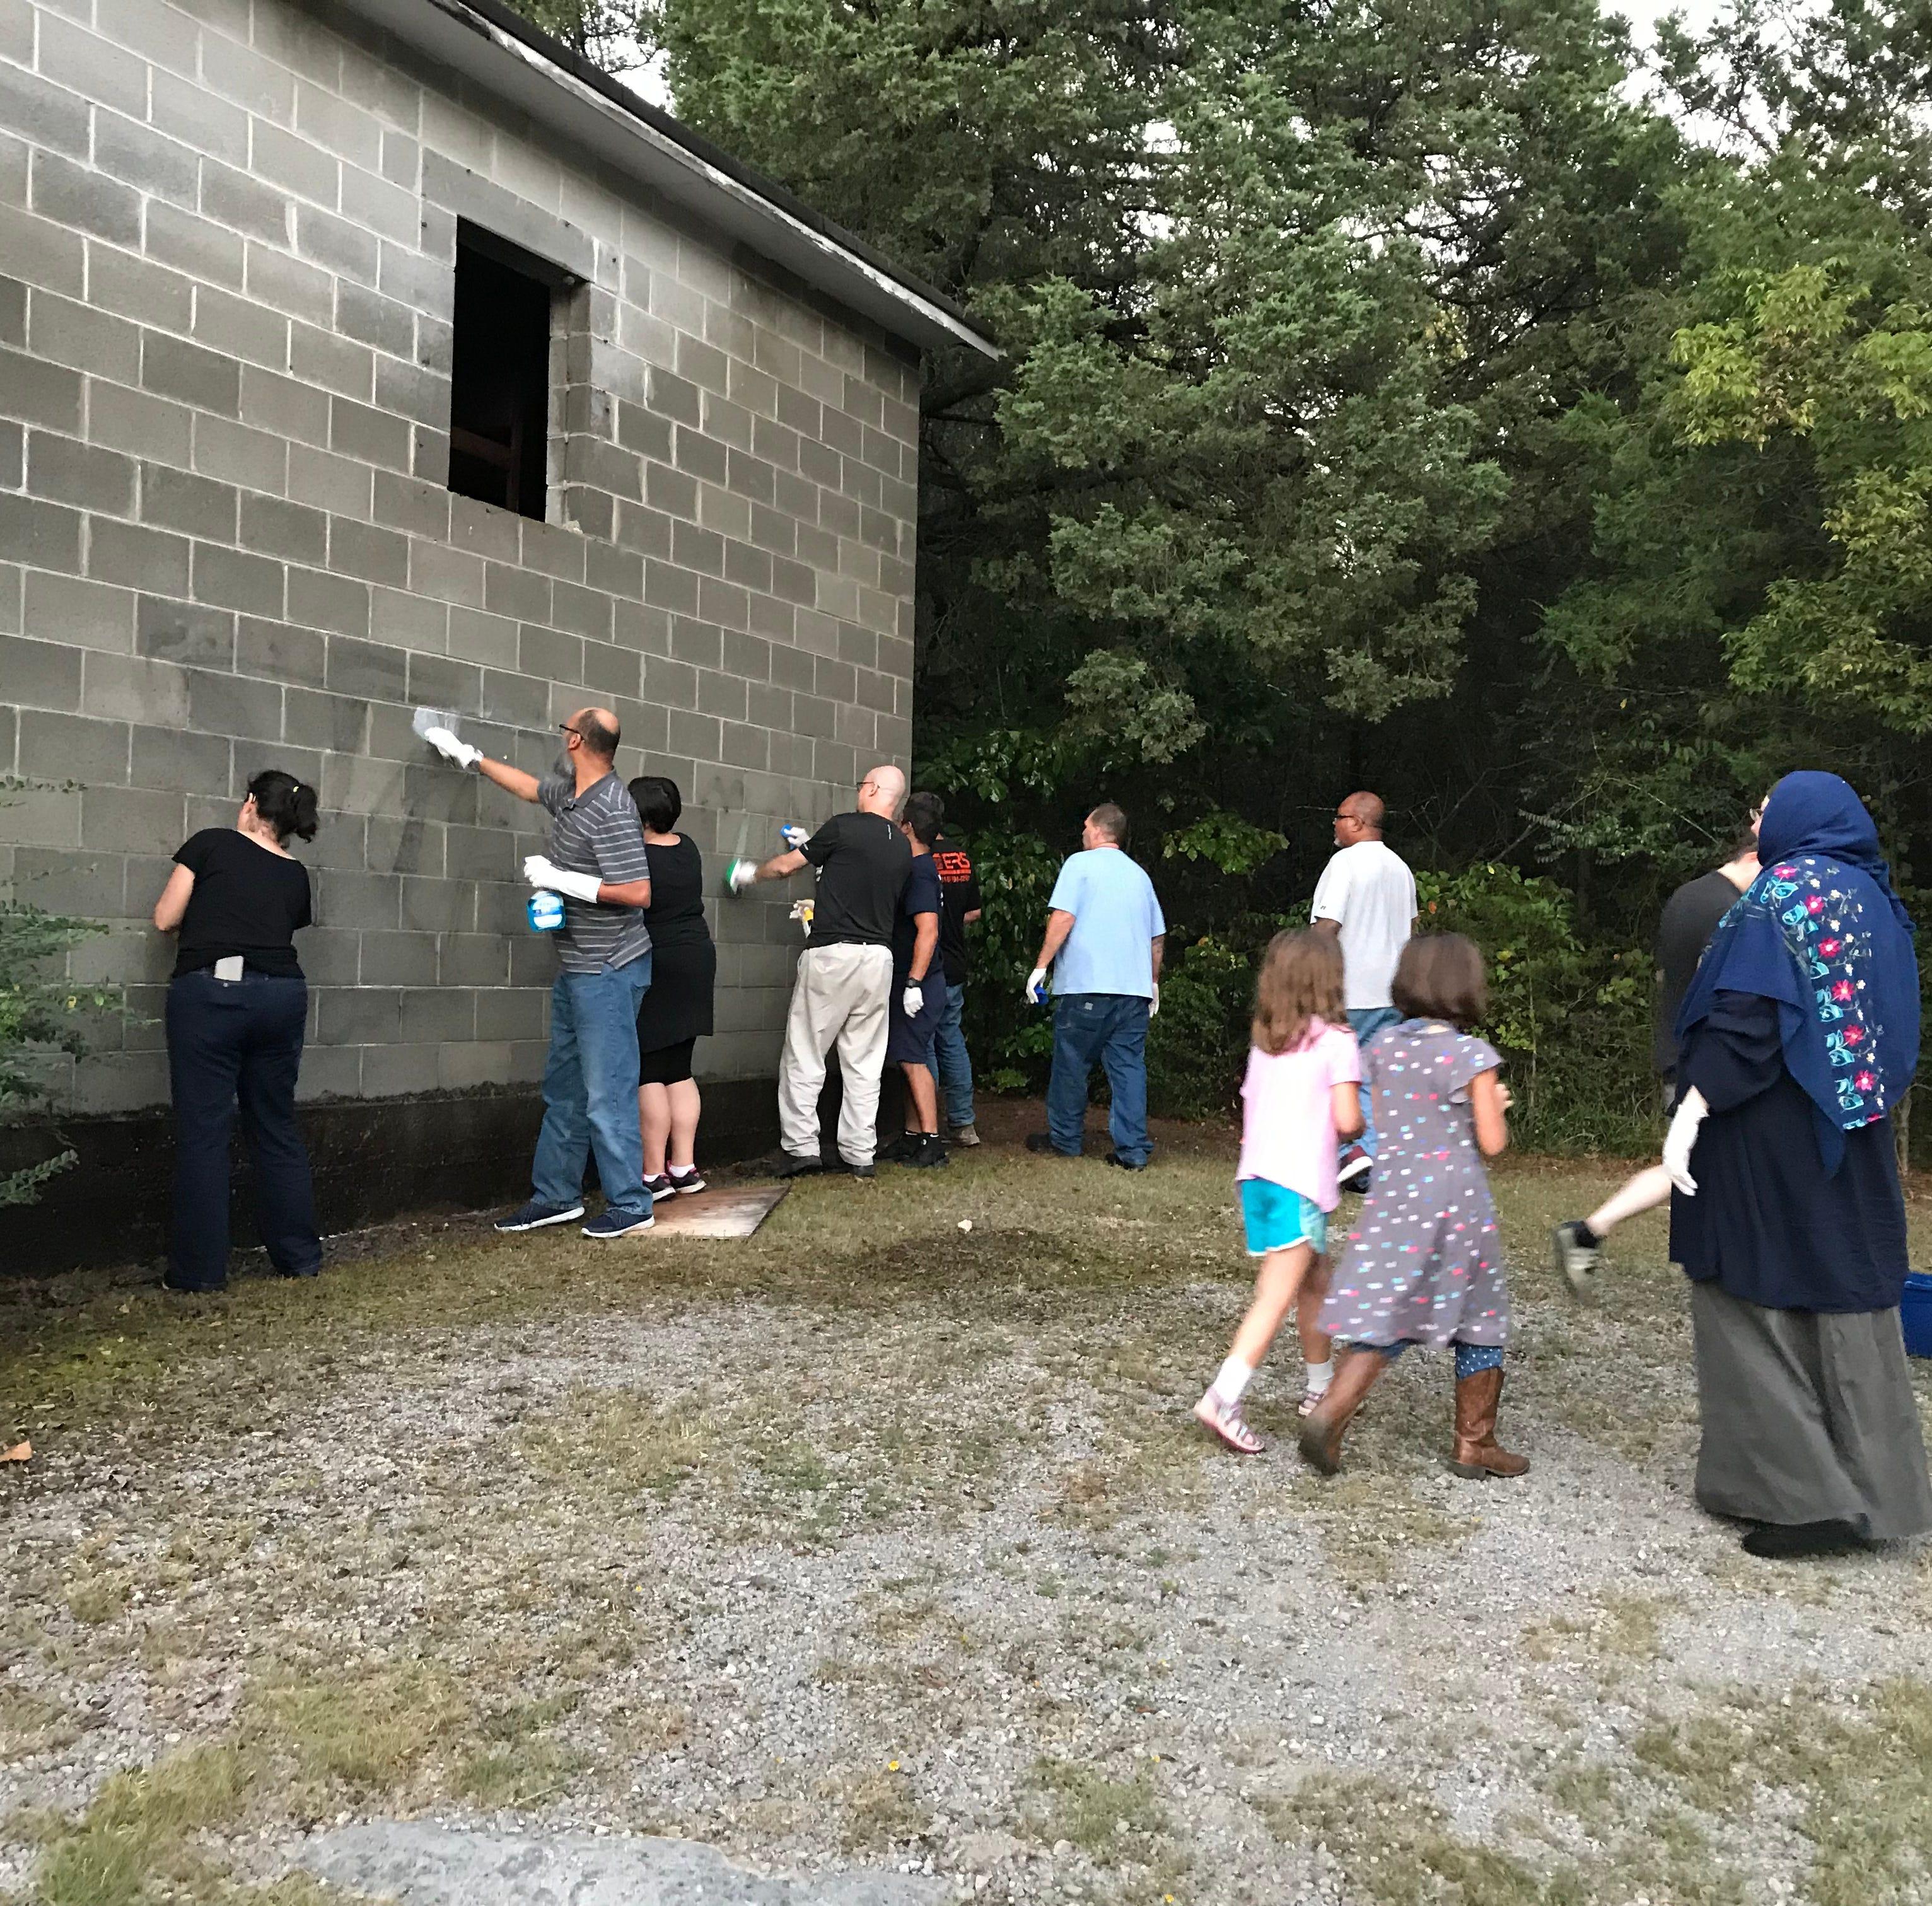 Murfreesboro community gathers to clean 'white power' vandalism at predominantly black church